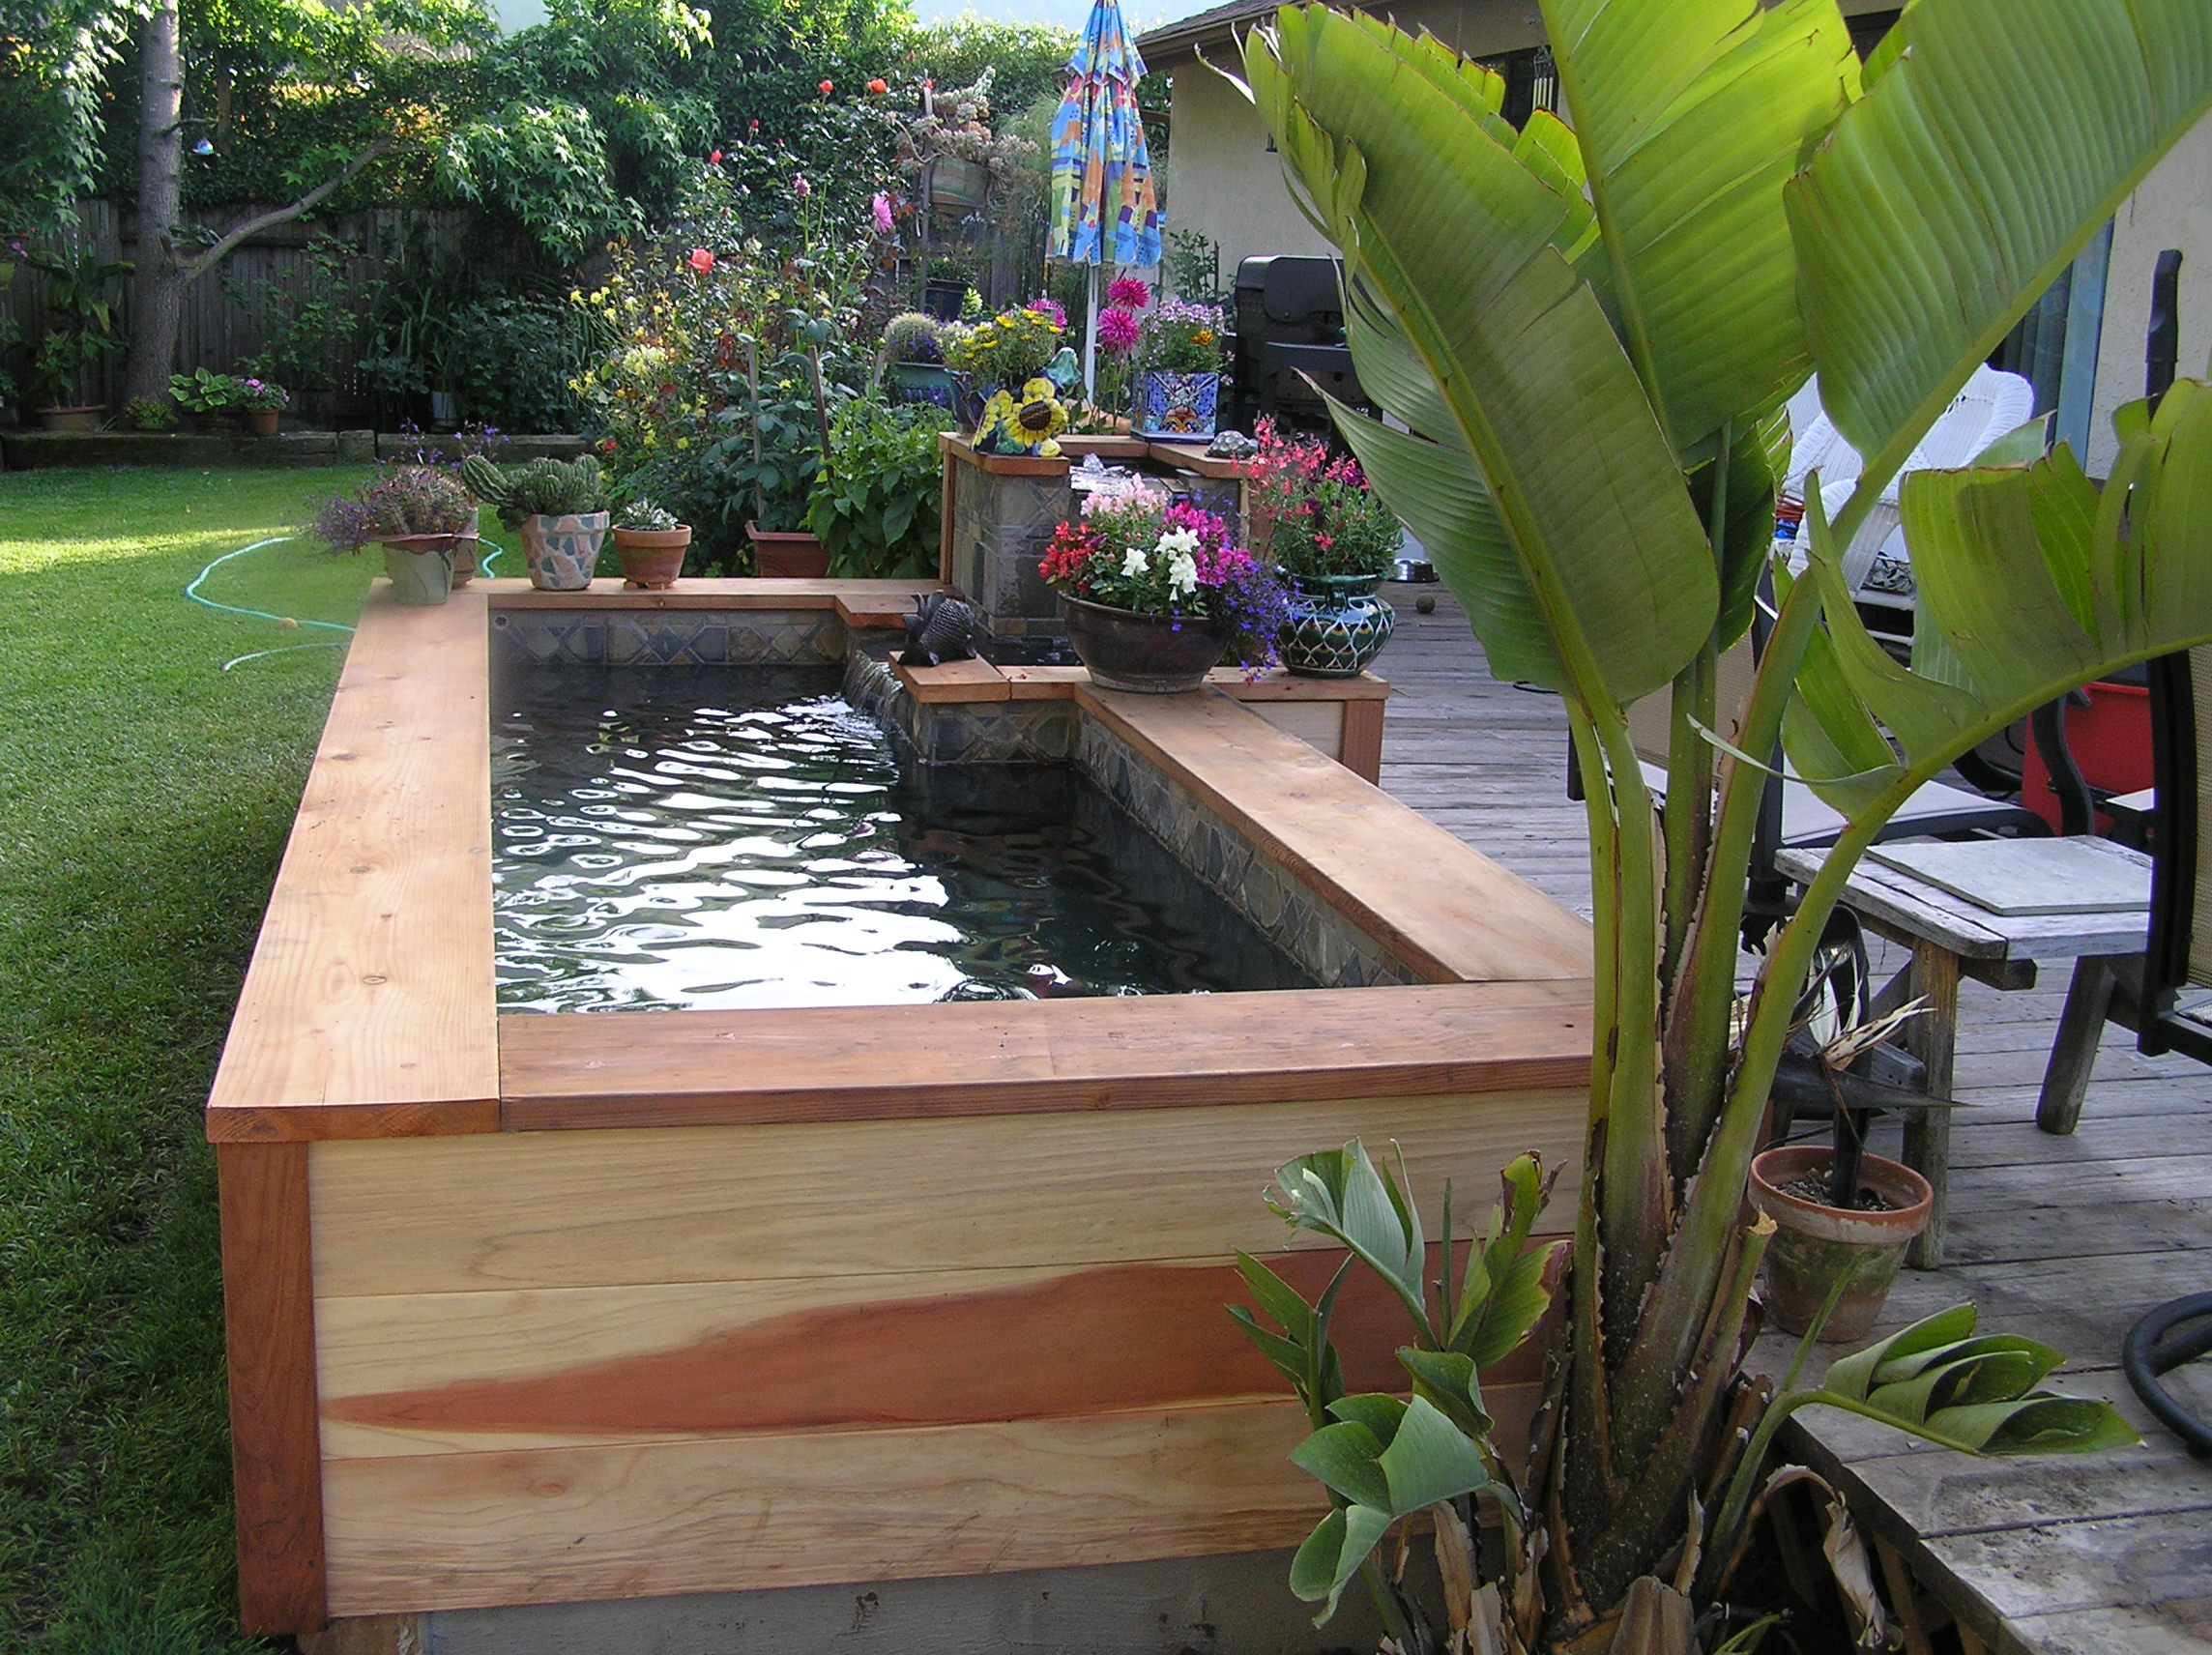 5 Questions À Se Poser Avant De Construire Un Bassin Hors Sol encequiconcerne Créer Un Bassin De Jardin